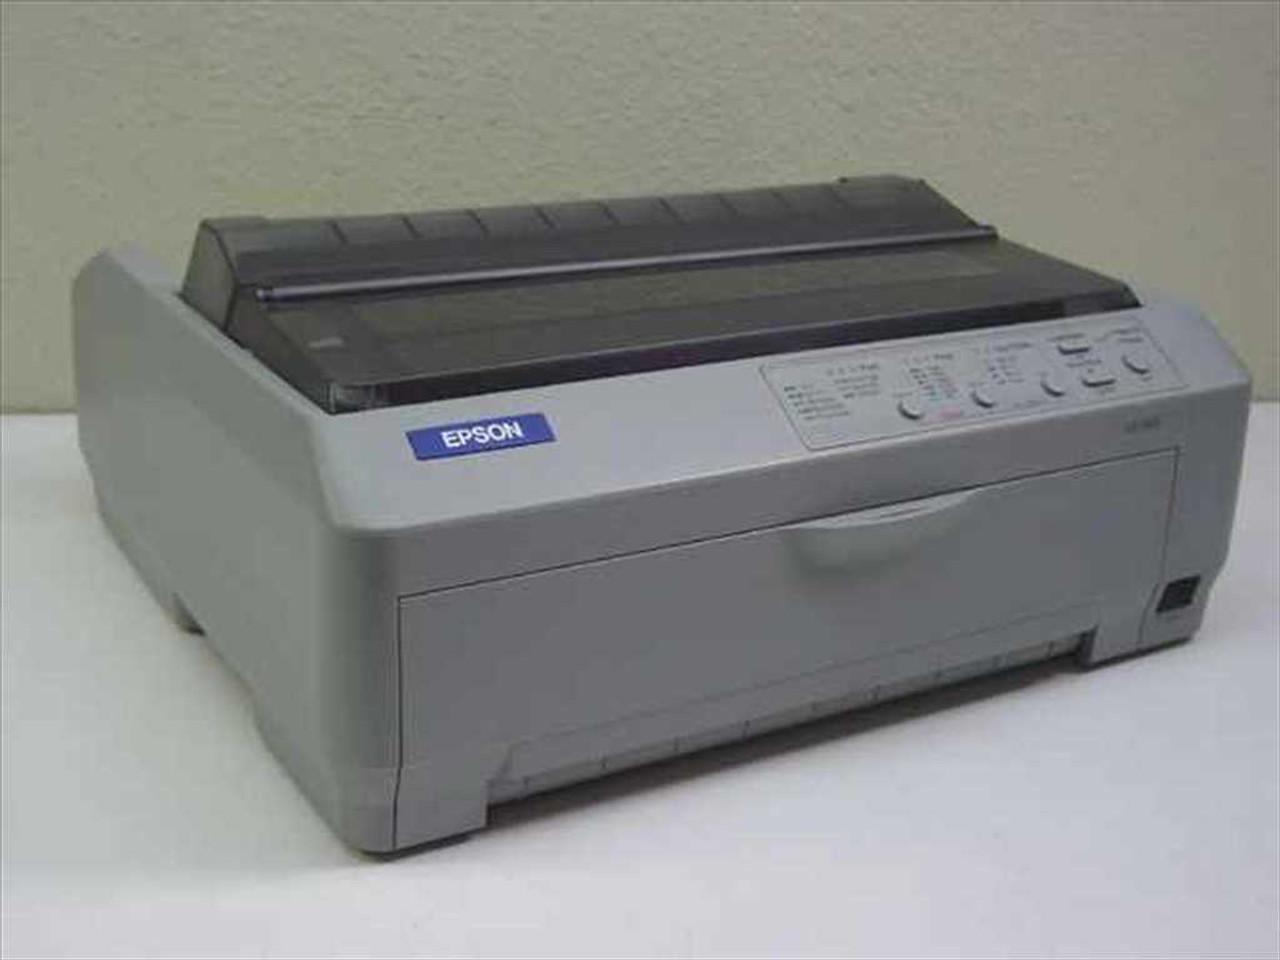 Epson LQ-590 Dot Matrix Printer - Missing Plastic Cover P363A